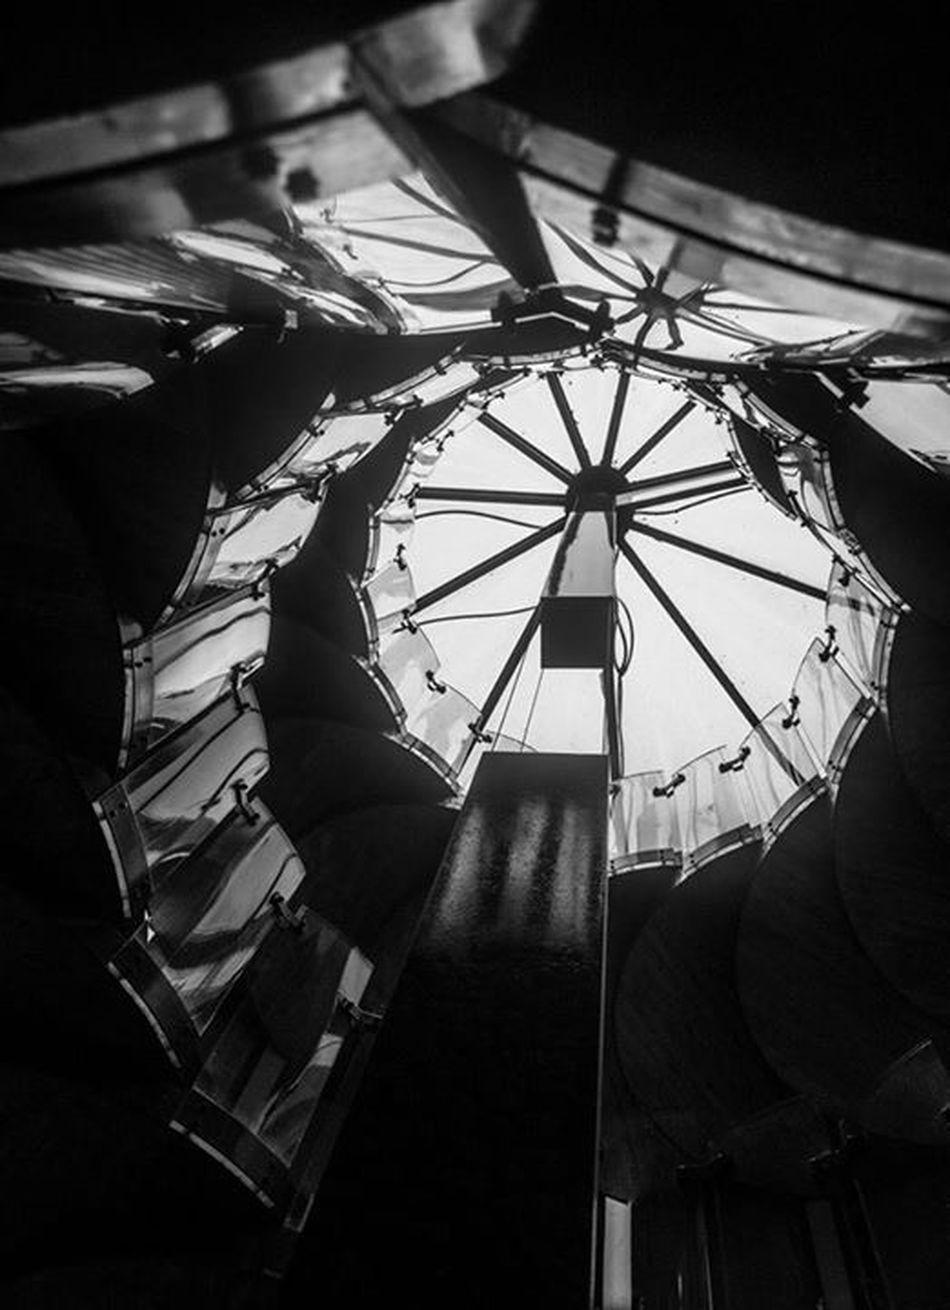 Stairs Perspectives Blackandwhite Taking Photos